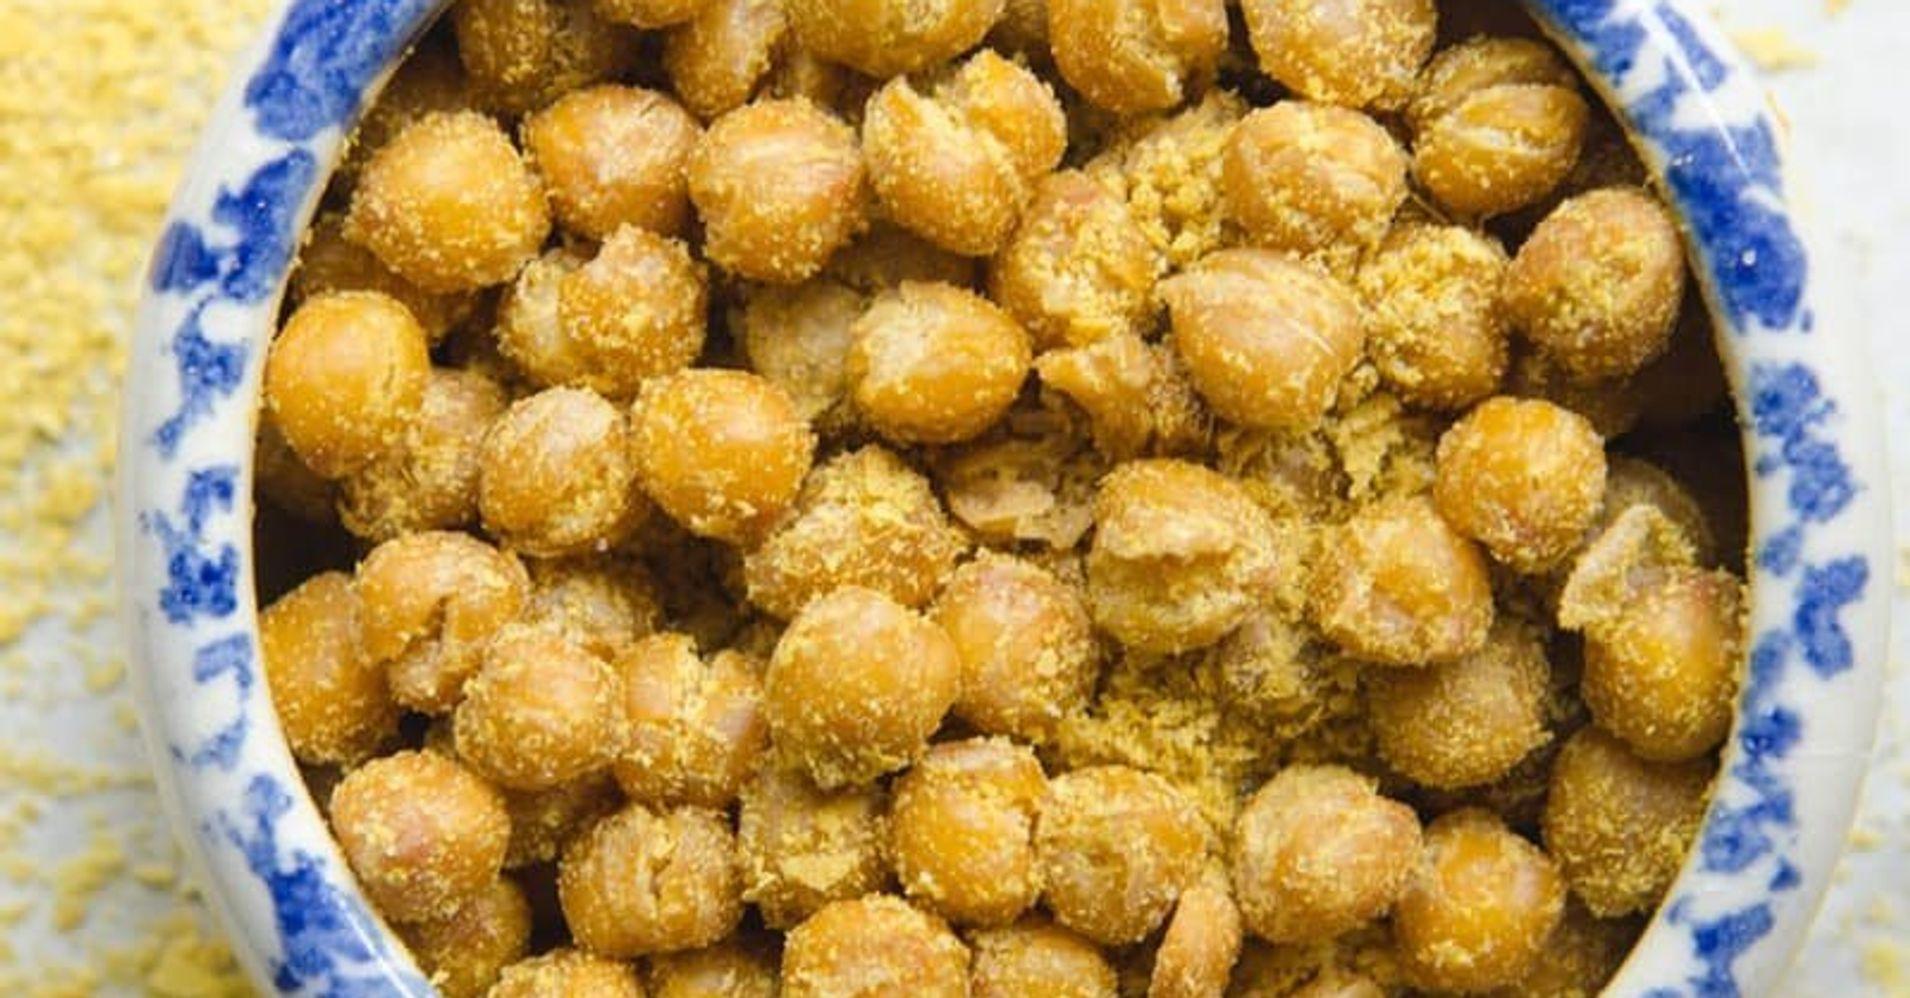 how to make chickpeas taste like meat